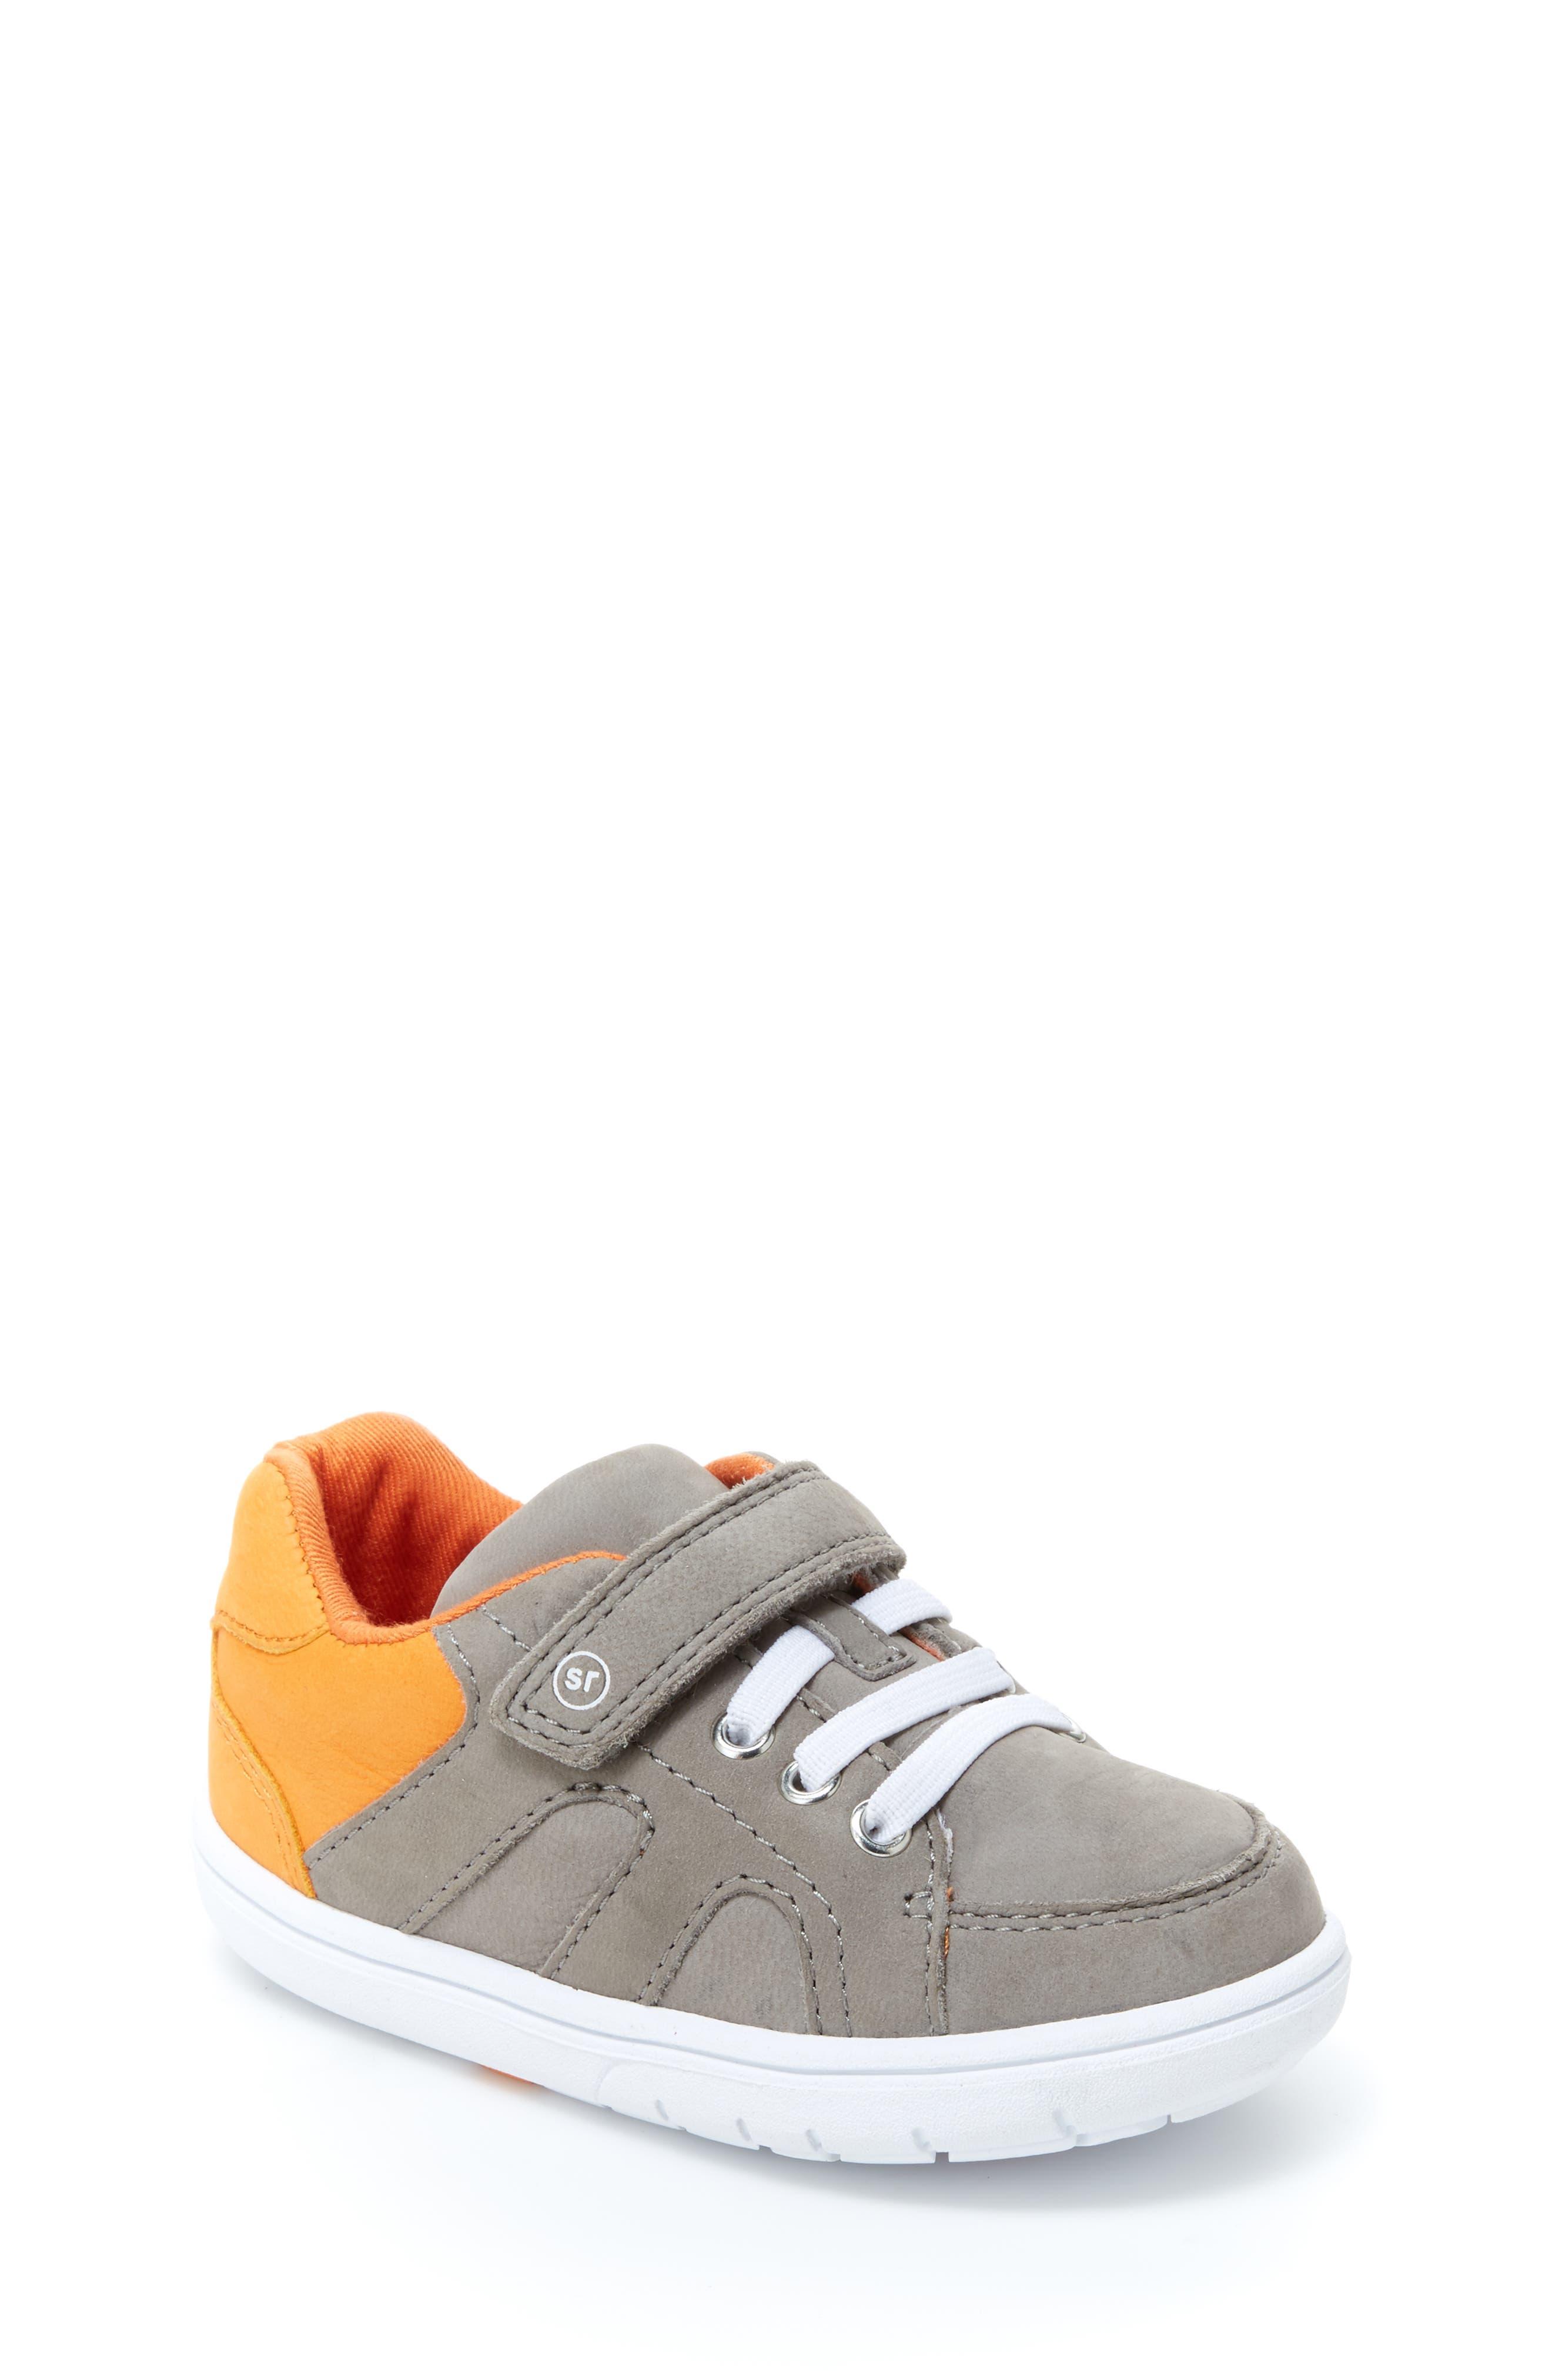 SRT Noe Sneaker,                         Main,                         color, Grey/ Orange